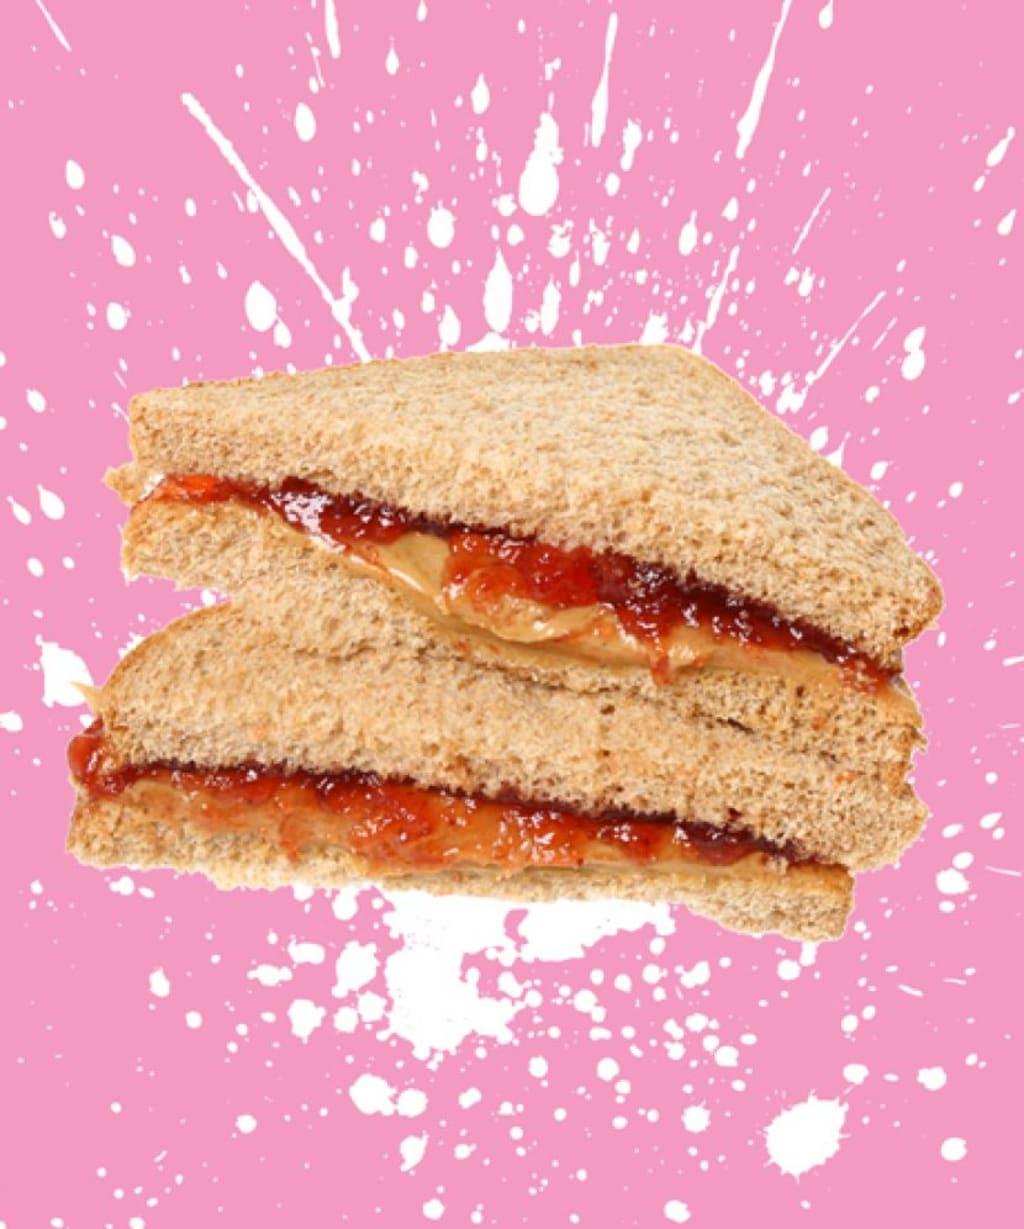 How To Make A Marijuana Peanut Butter and Jelly Sandwich